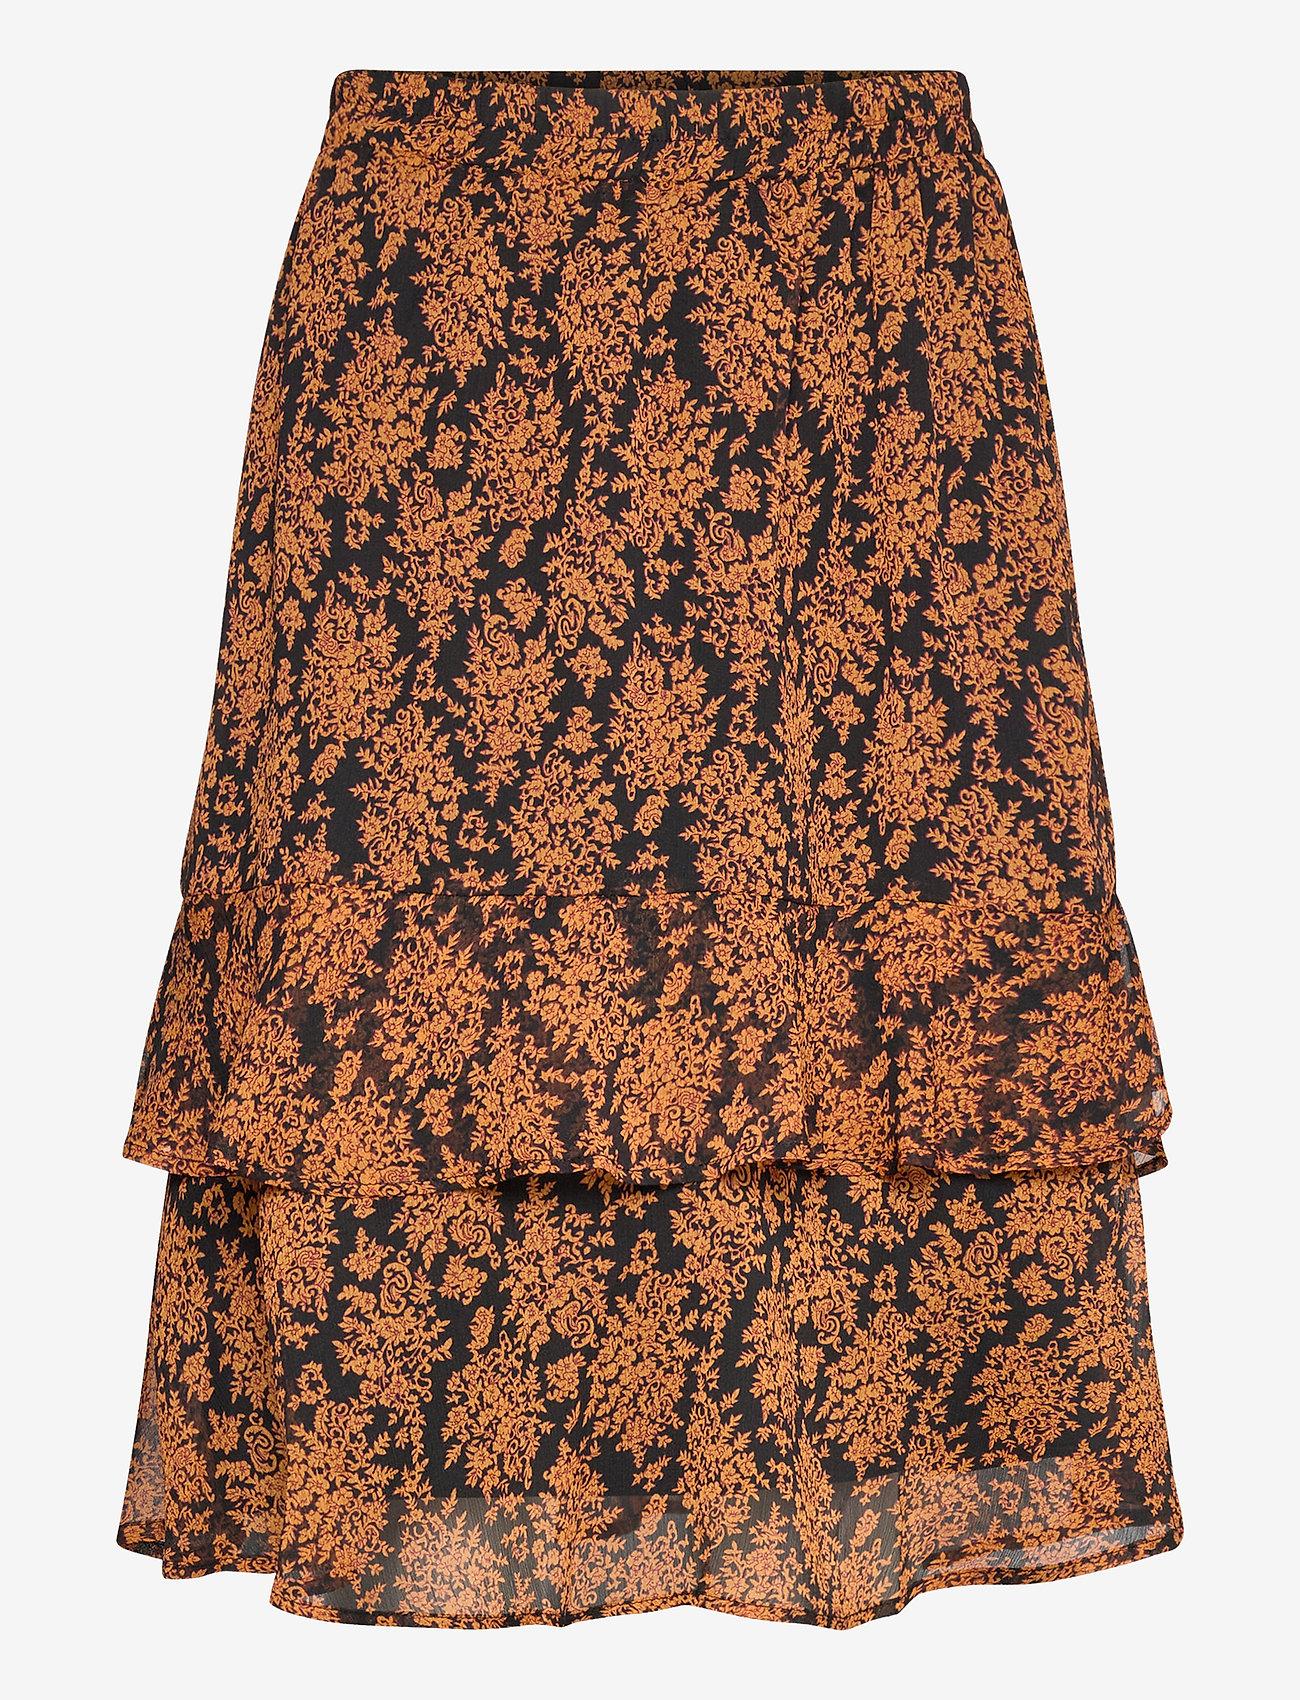 Minus - Leyla skirt - midinederdele - orange sunset flower print - 0